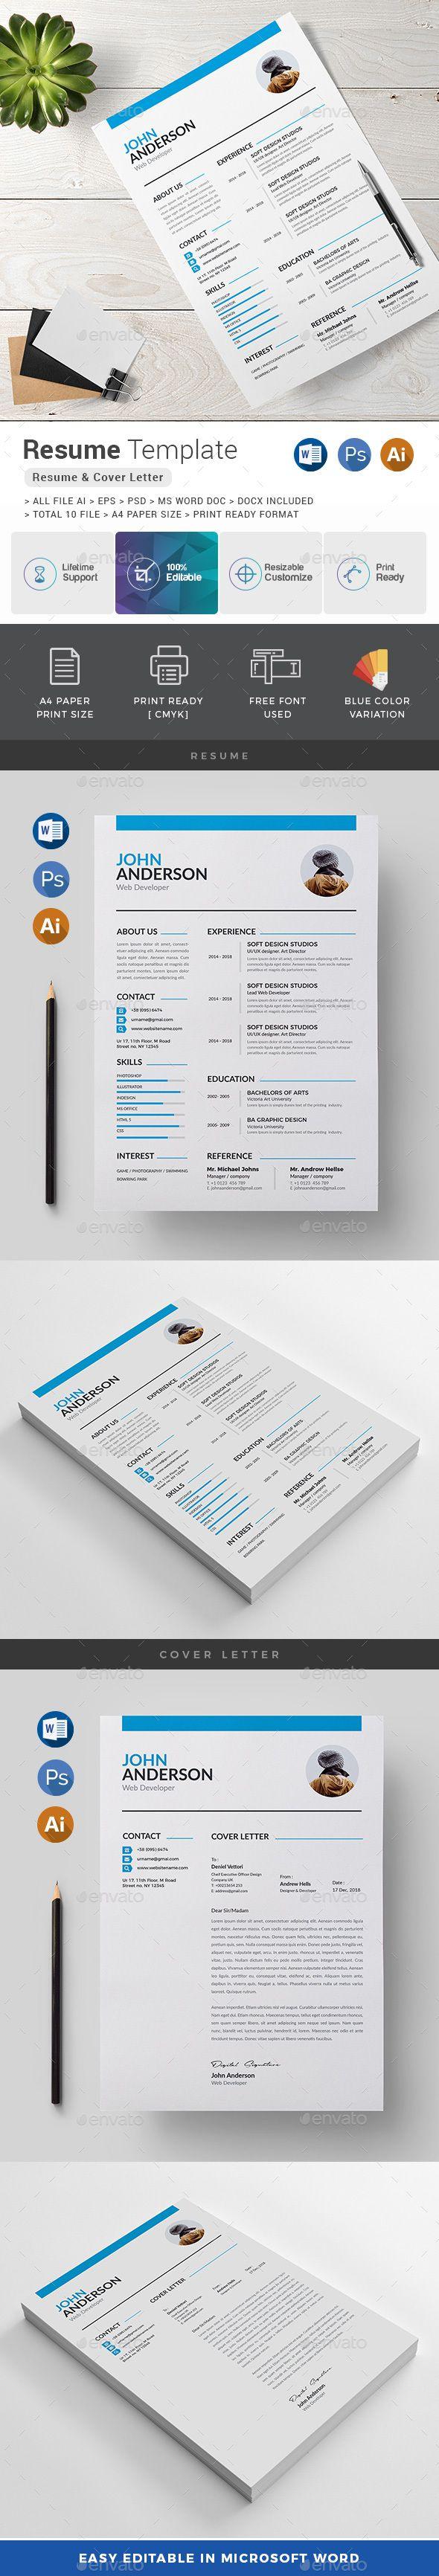 Resume | Template, Ai illustrator and Resume cv